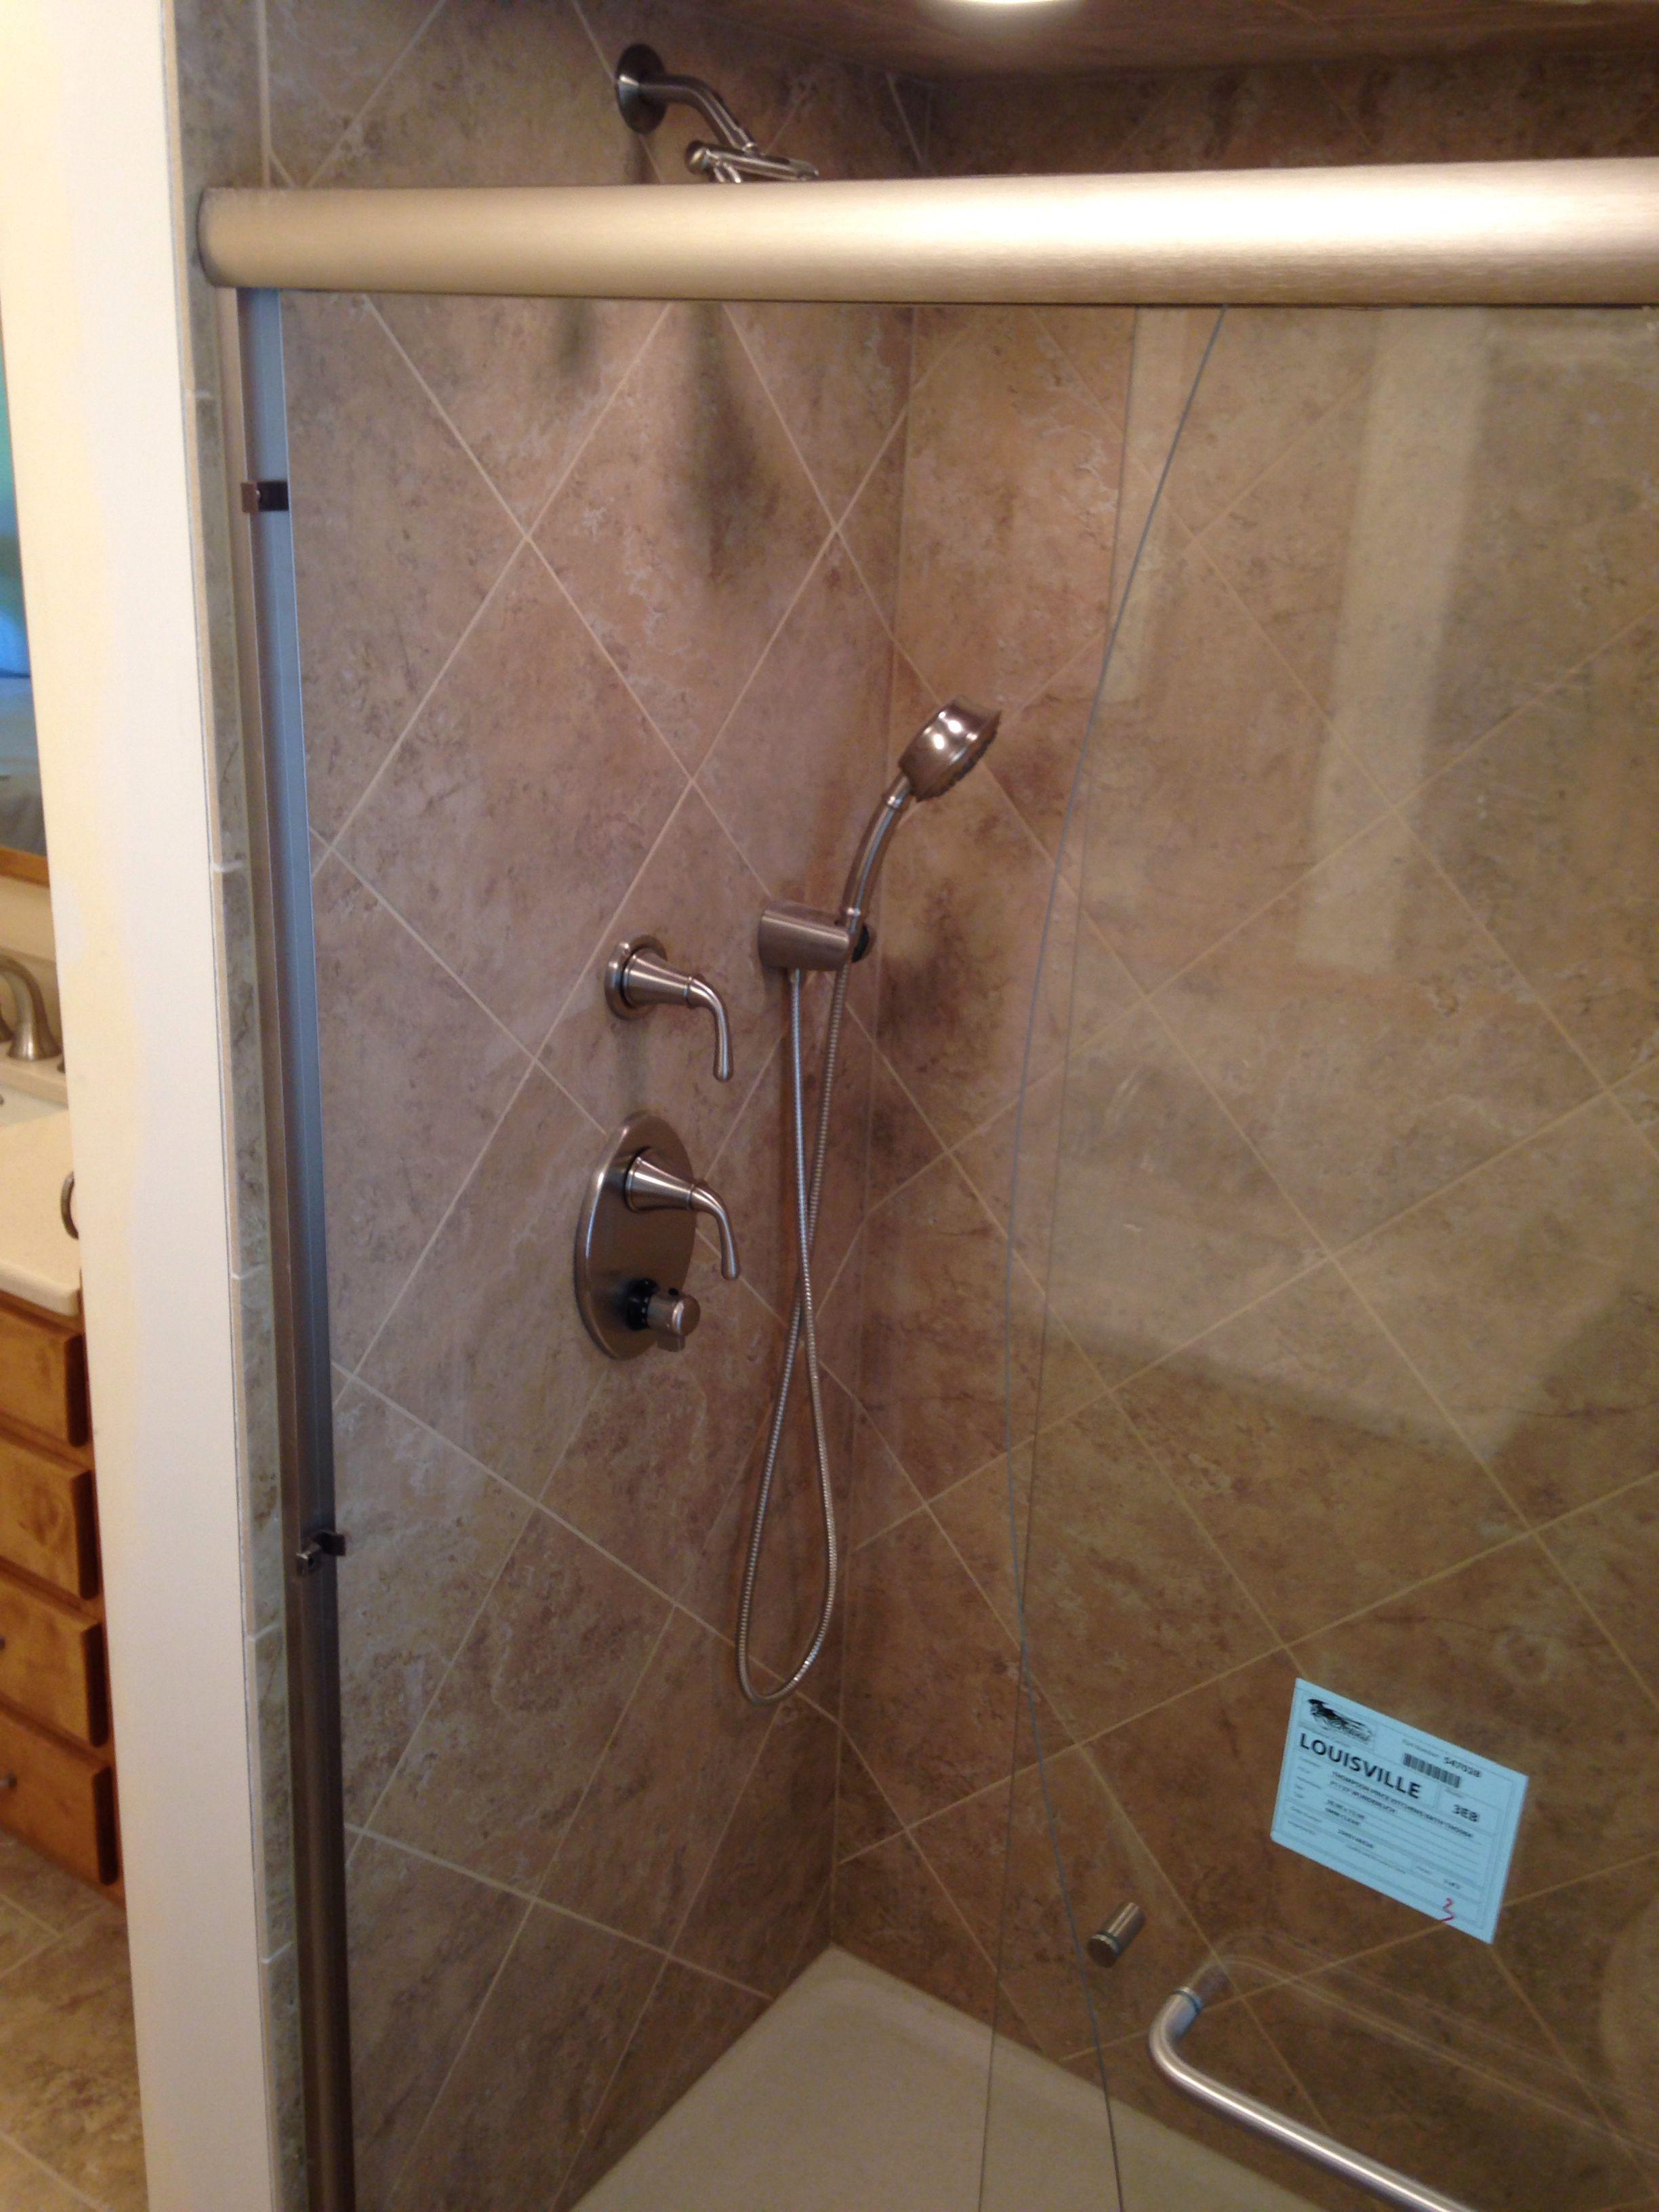 Diagonal shower lay.